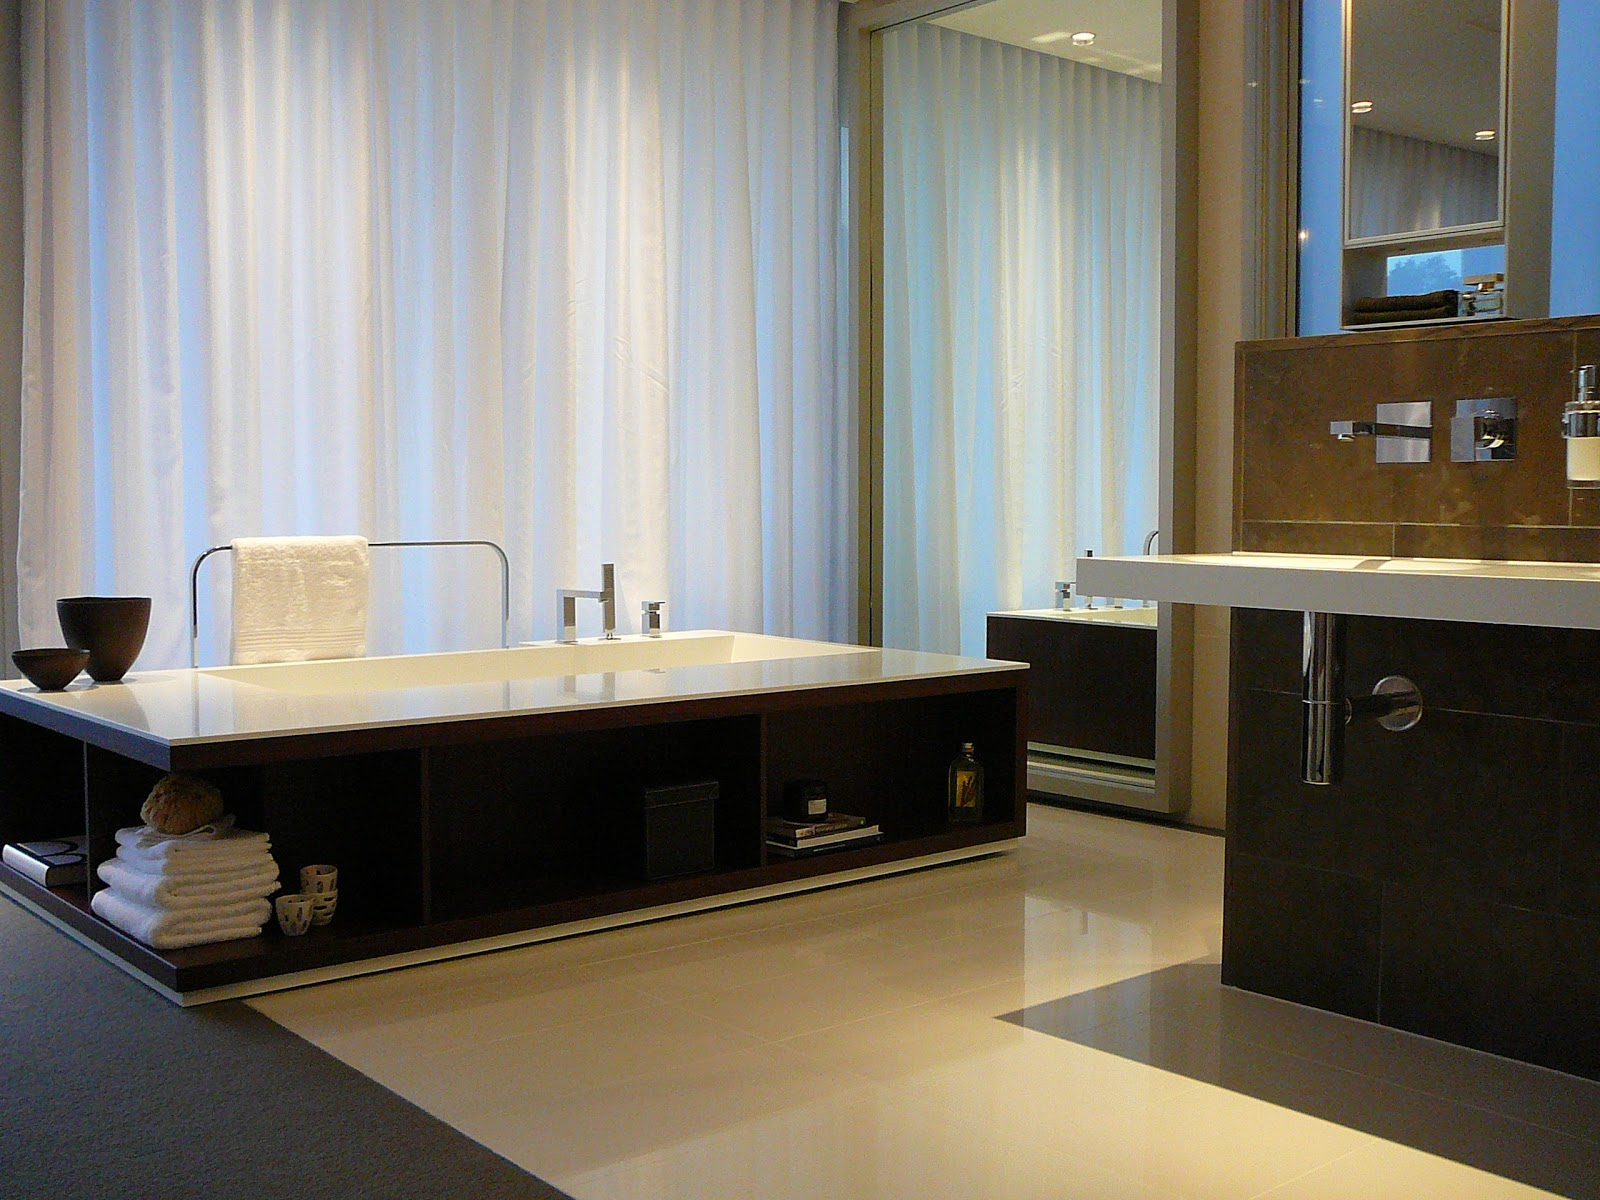 Minosa new minosa bathroom design resort style ensuite - Minosa The New Modern Design Parents Retreat Vs Ensuite The Open Plan Bathroom